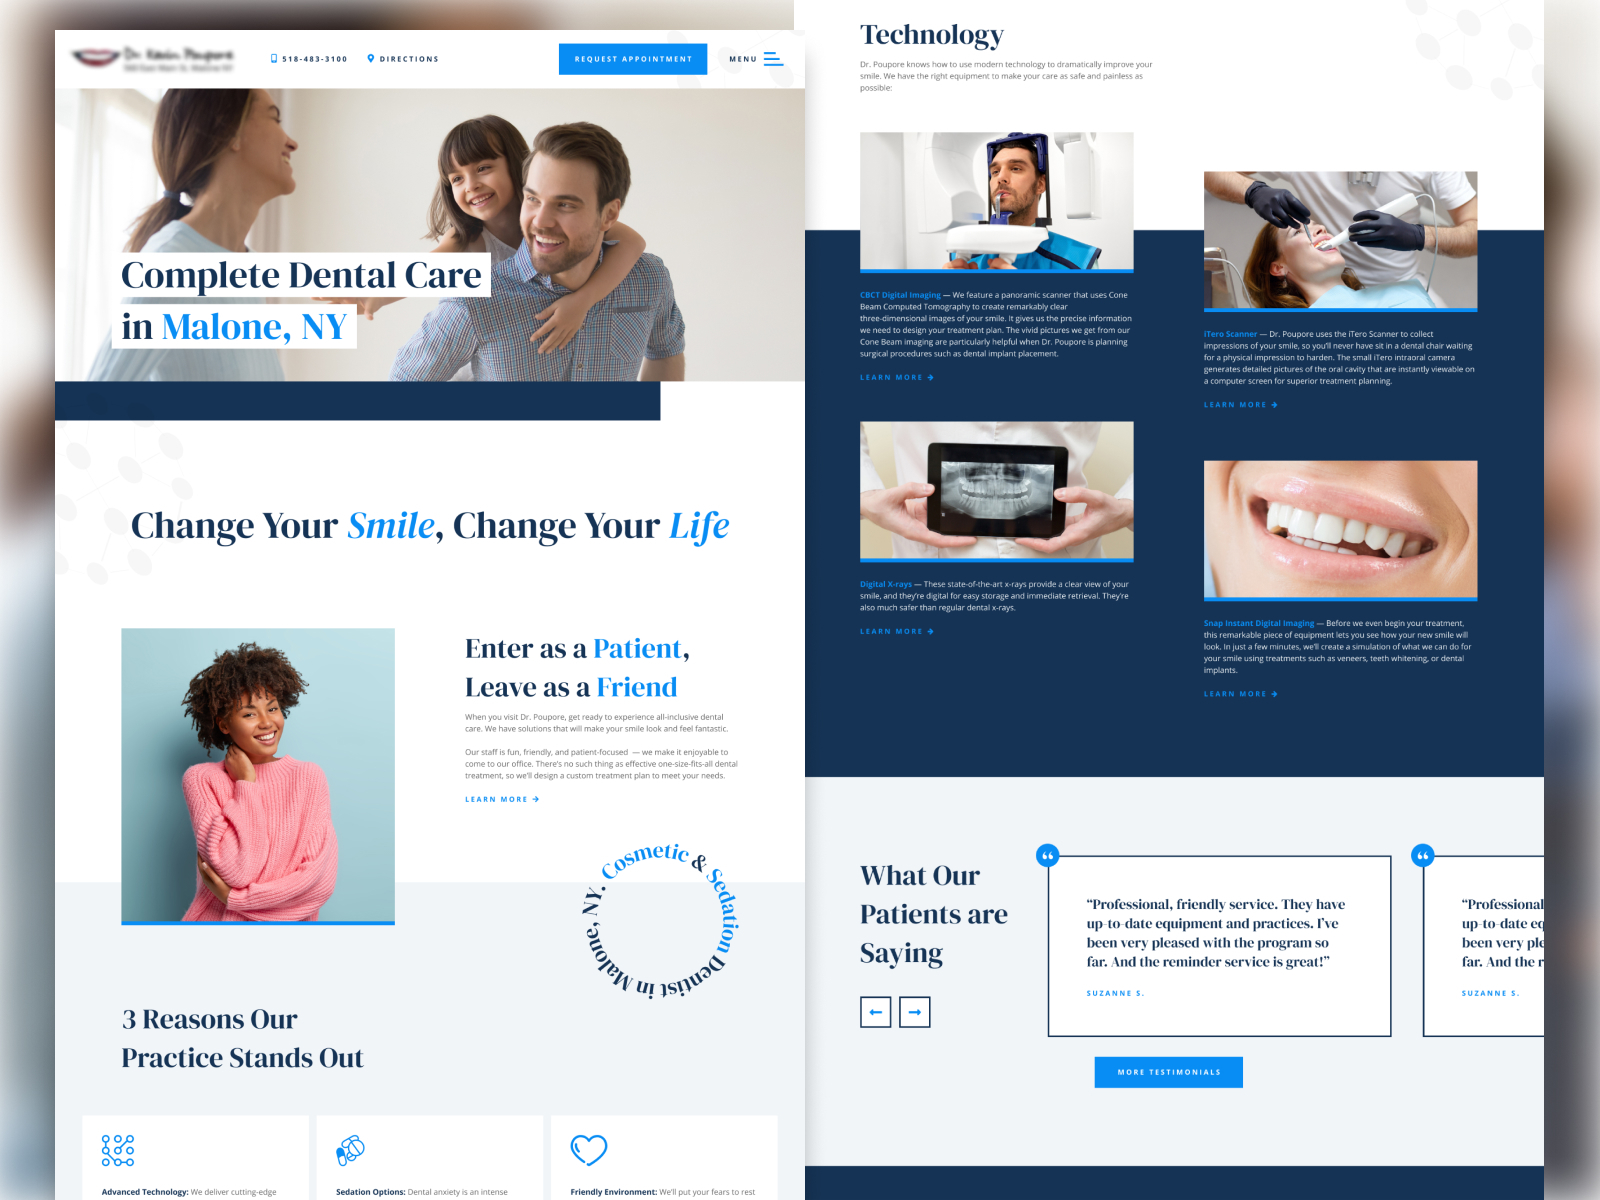 Medical Office Website Design Example #3